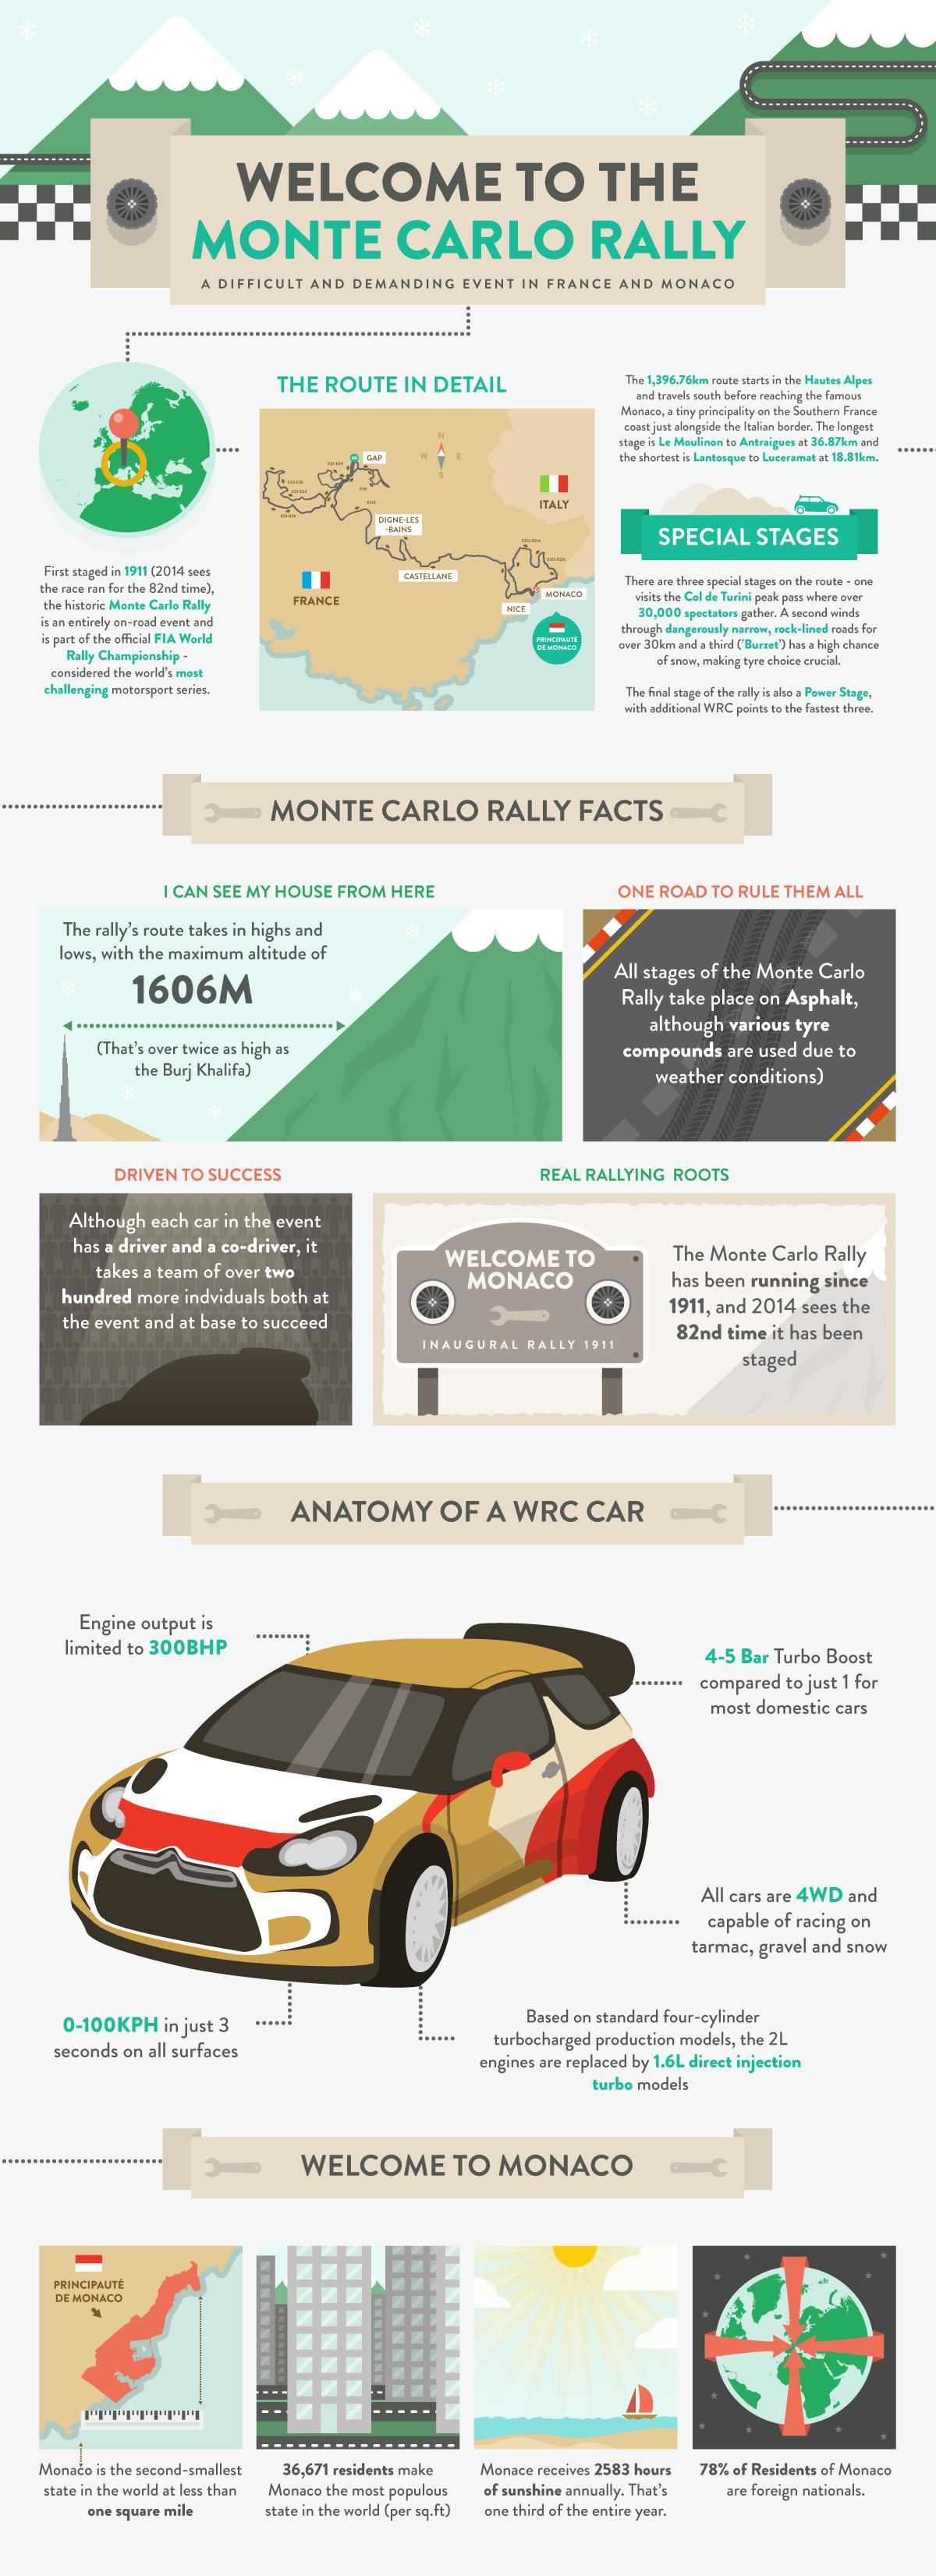 Monte Carlo Rally Infographic - Autoglass®